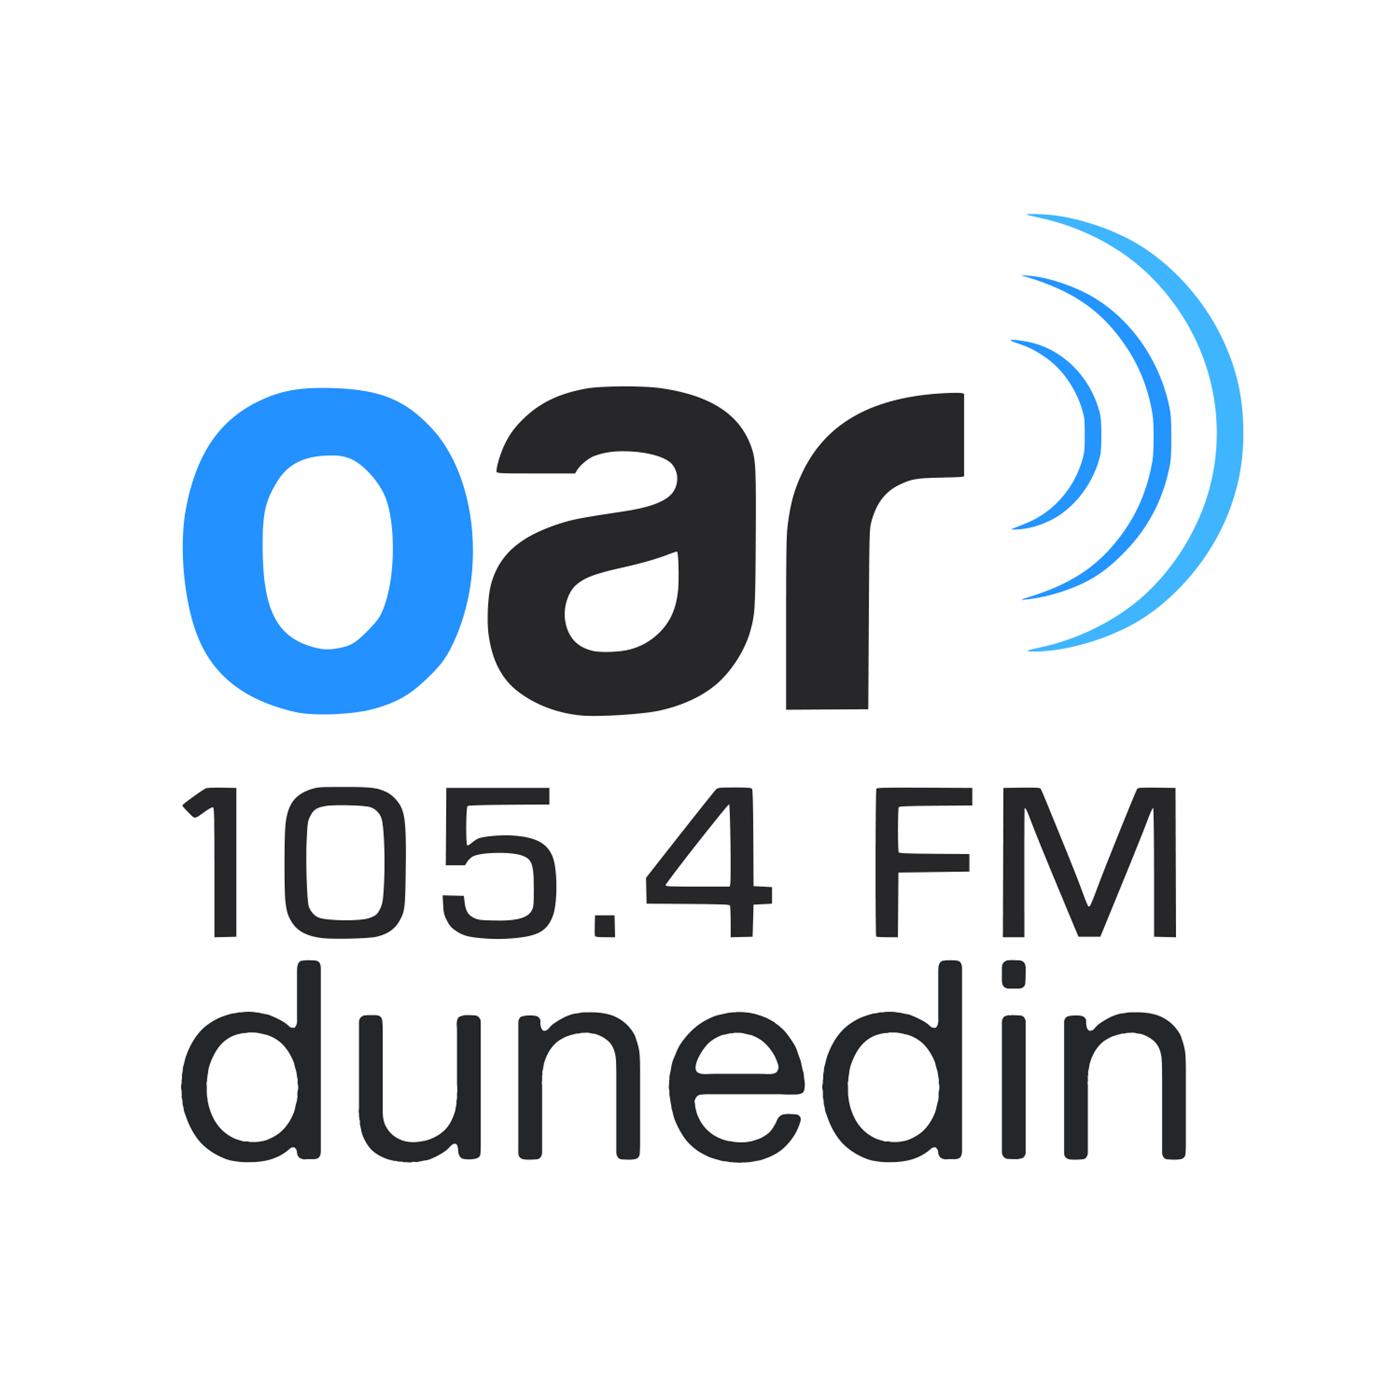 https://cdn.accessradio.org/StationFolder/otago/Images/OAR FM Logo Square6.png